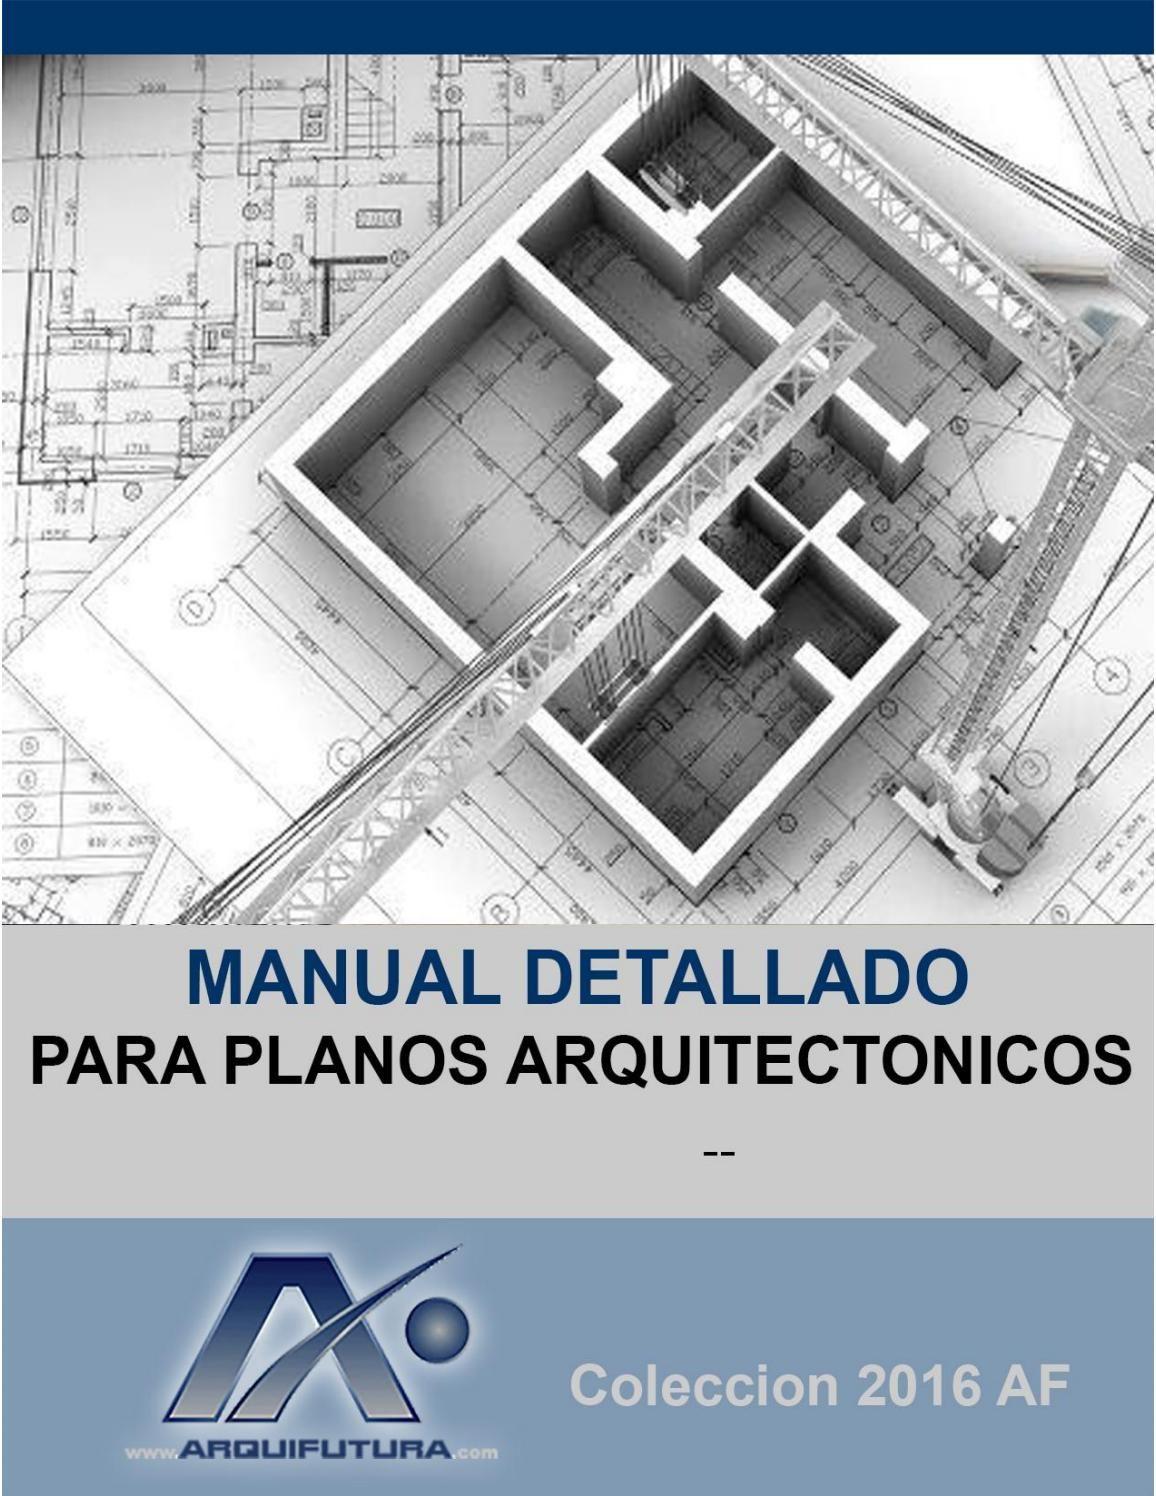 Flavio enrique ribera manual detallado para for Libros de planos arquitectonicos